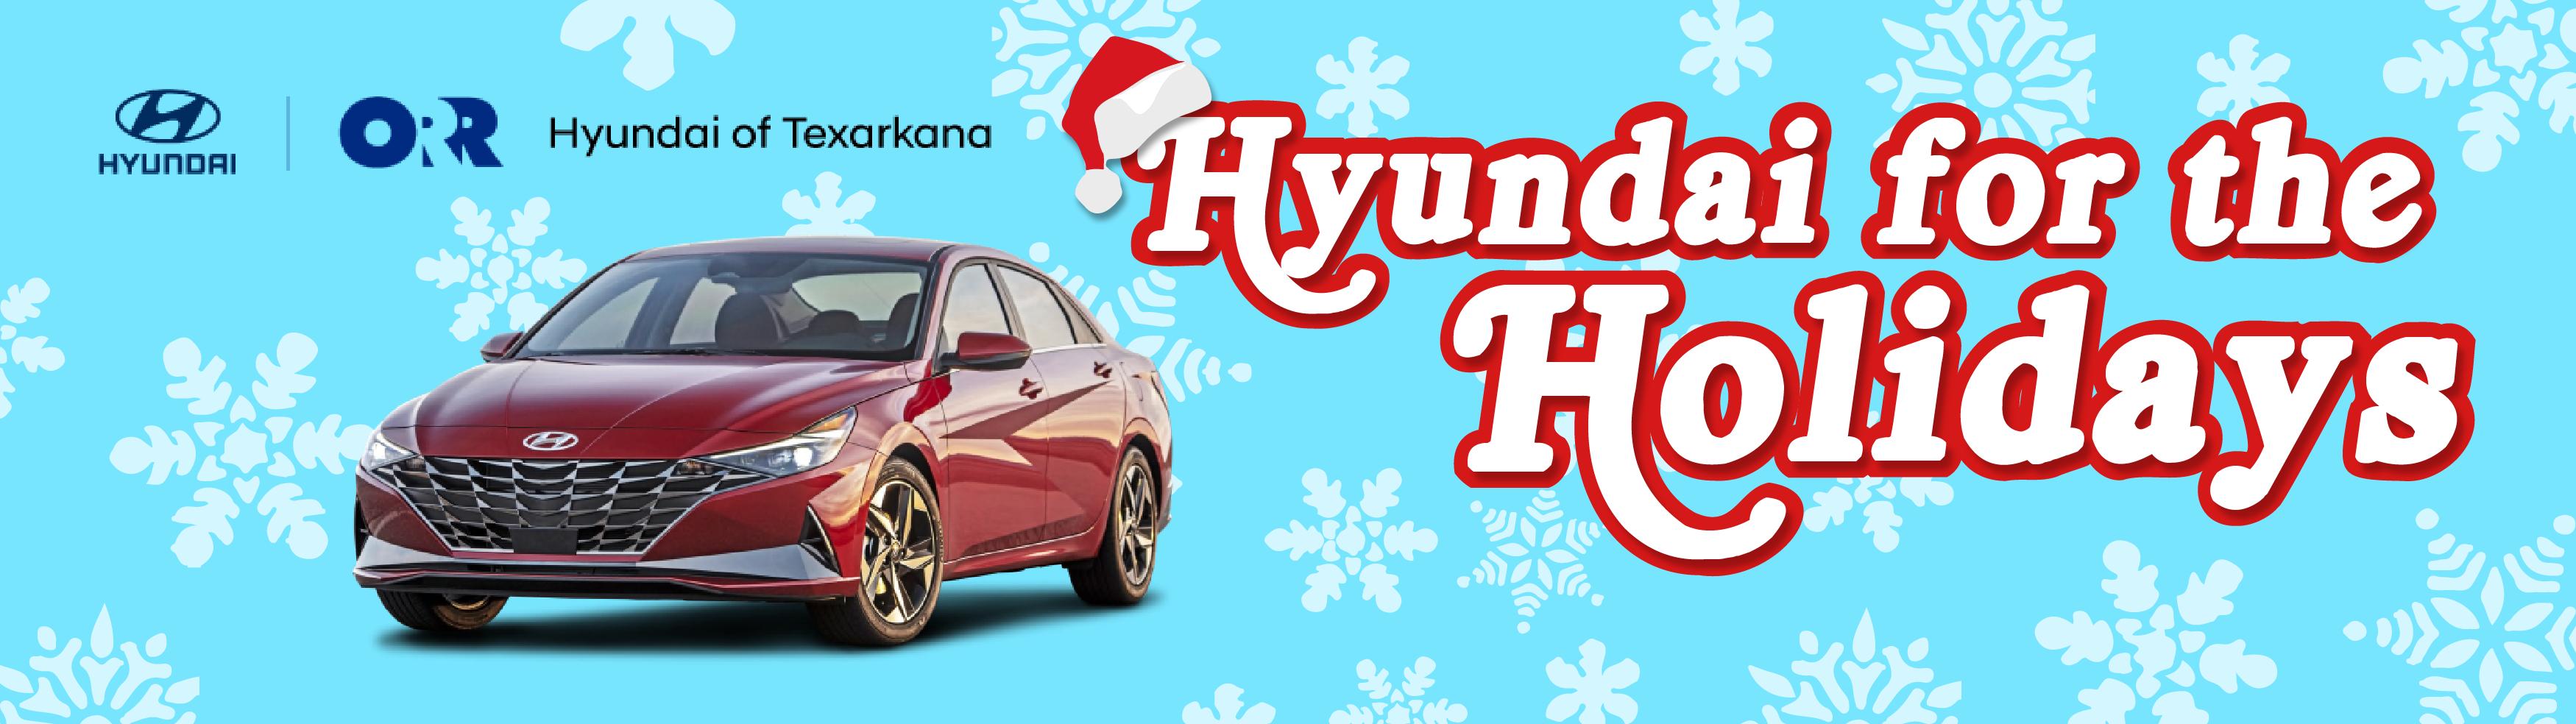 Hyundai For The Holidays